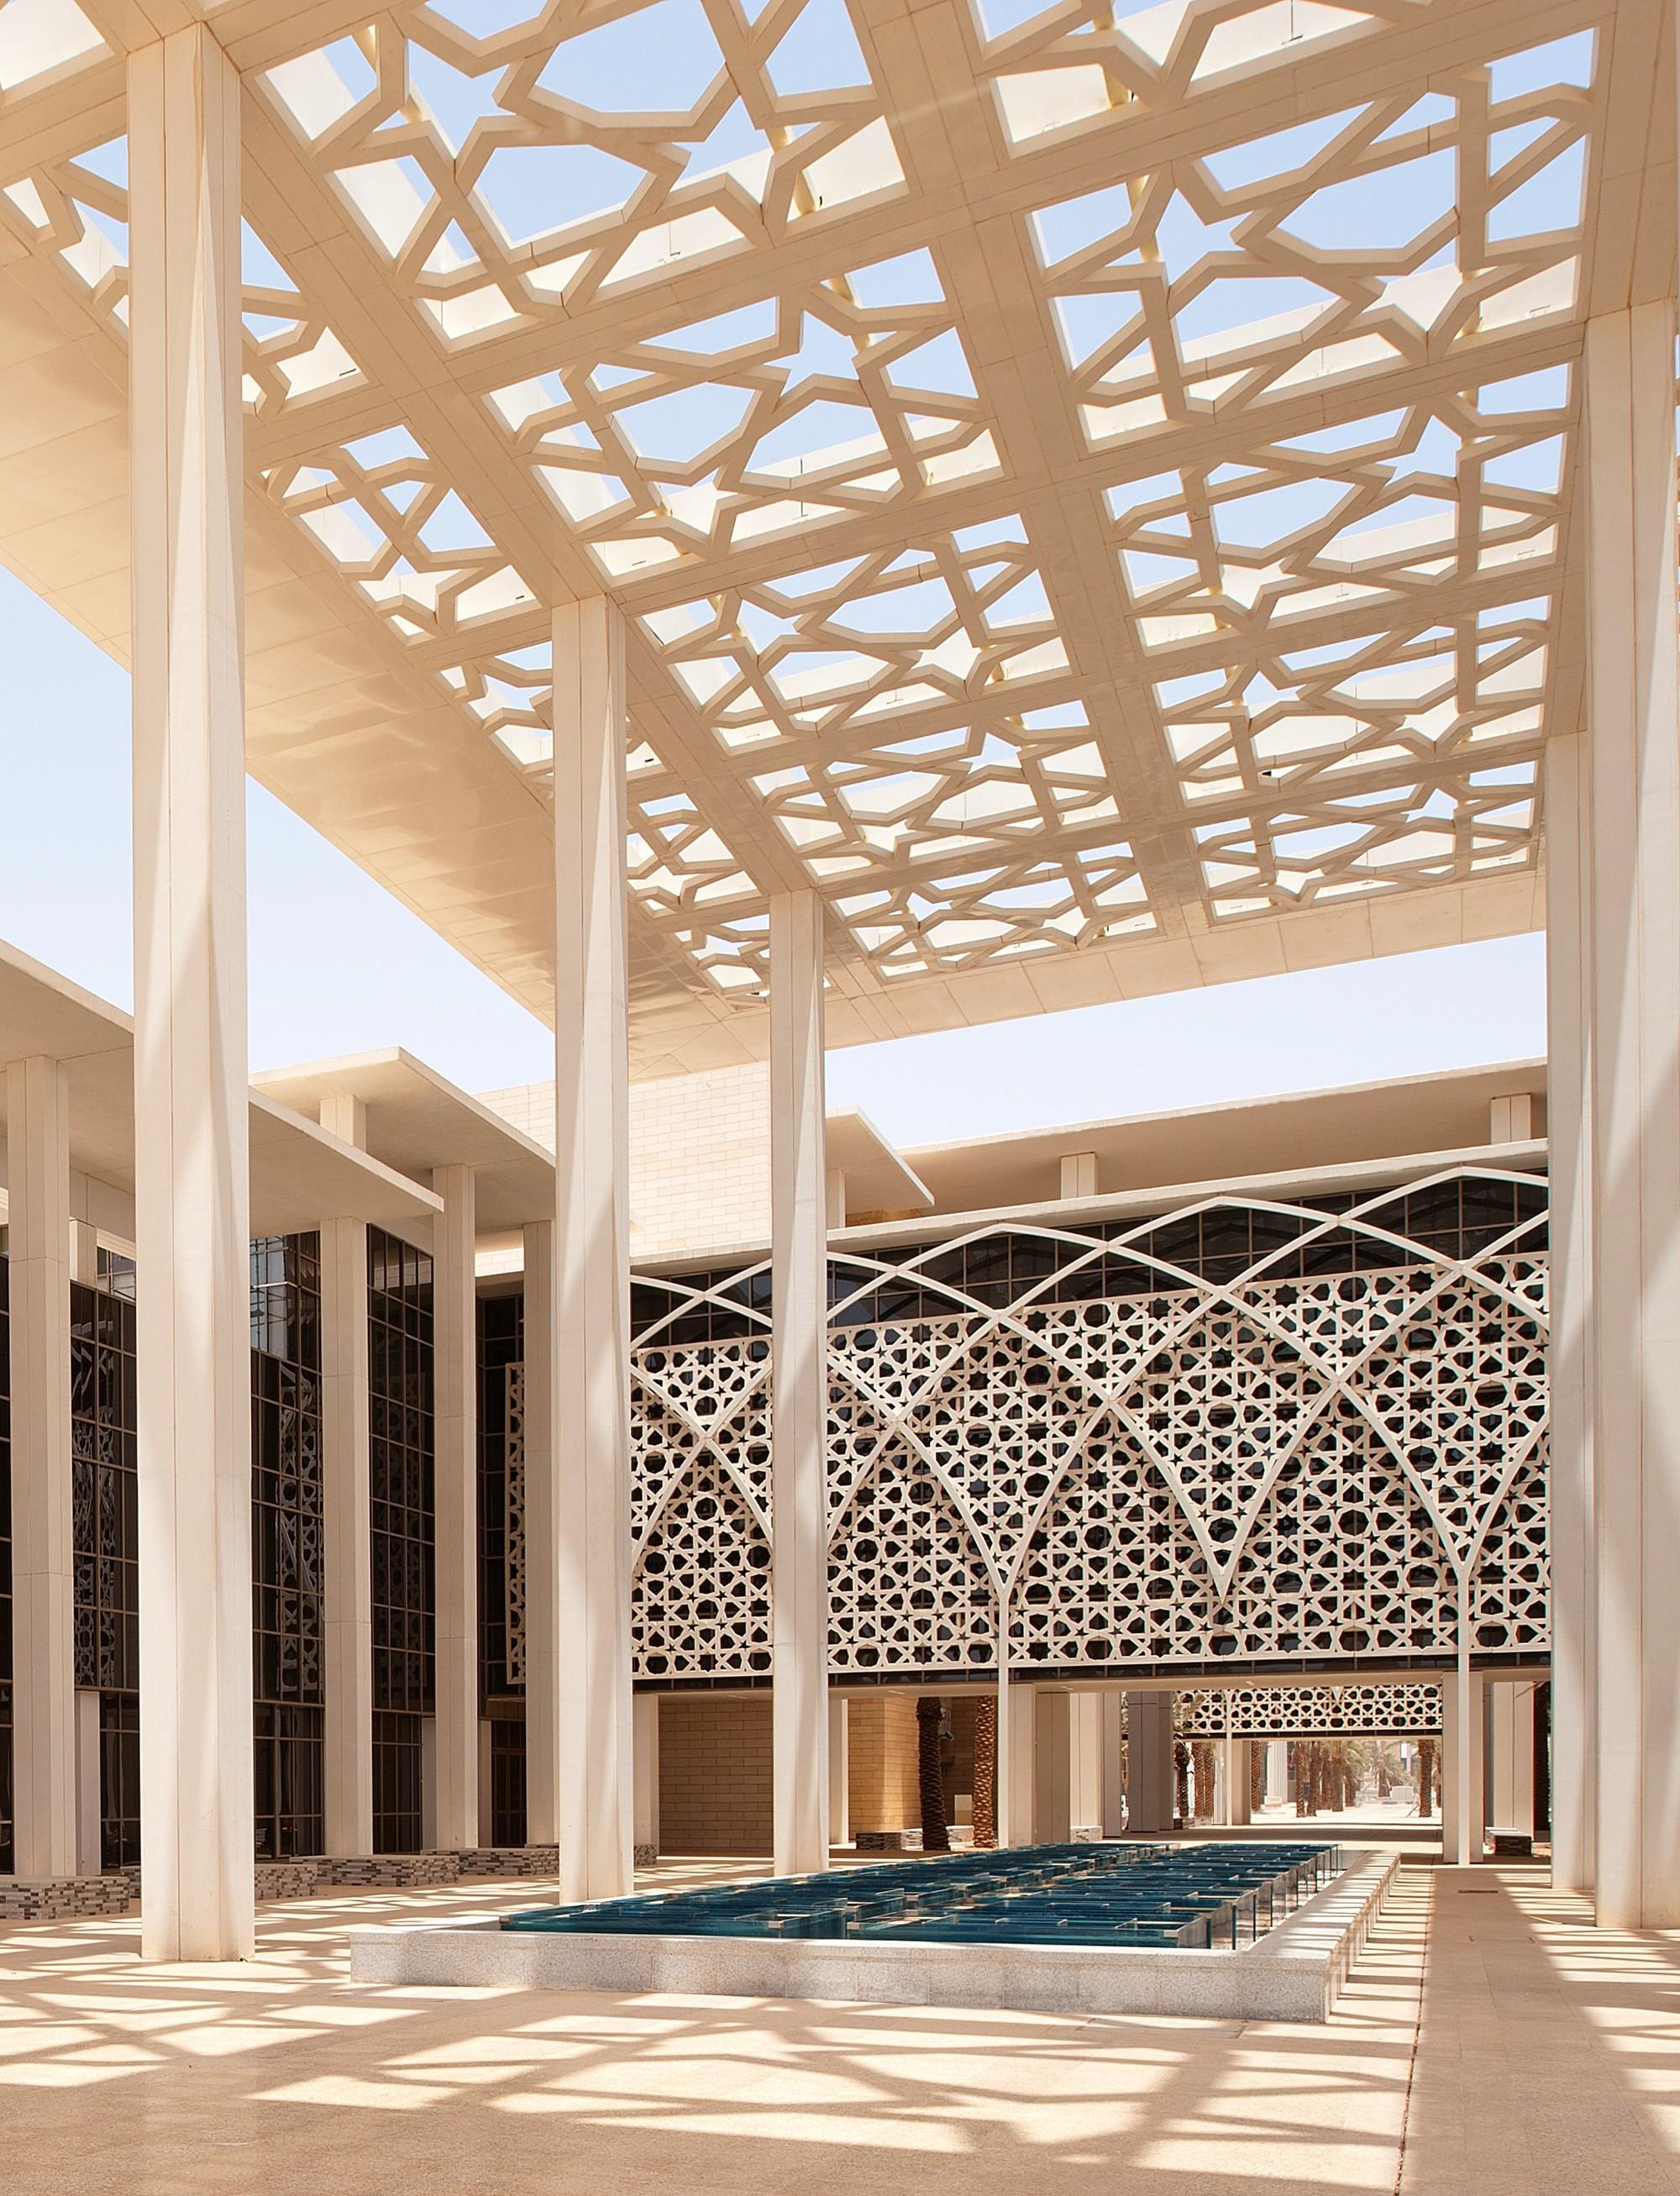 Gallery of princess nora bint abdulrahman university - Interior design schools in alabama ...